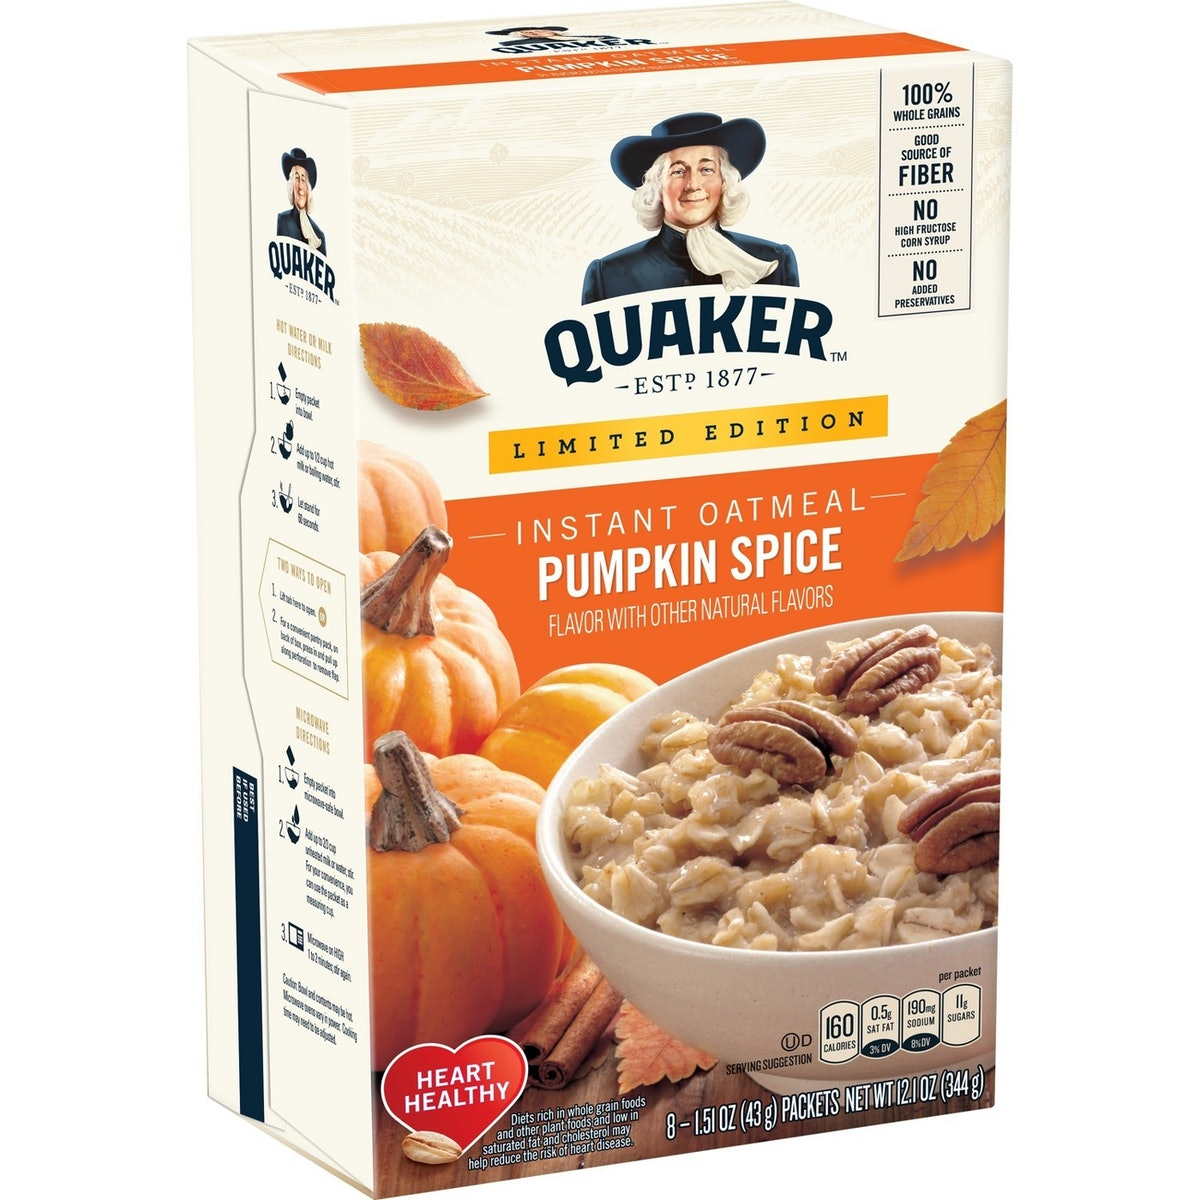 Quaker Pumpkin Spice Oatmeal